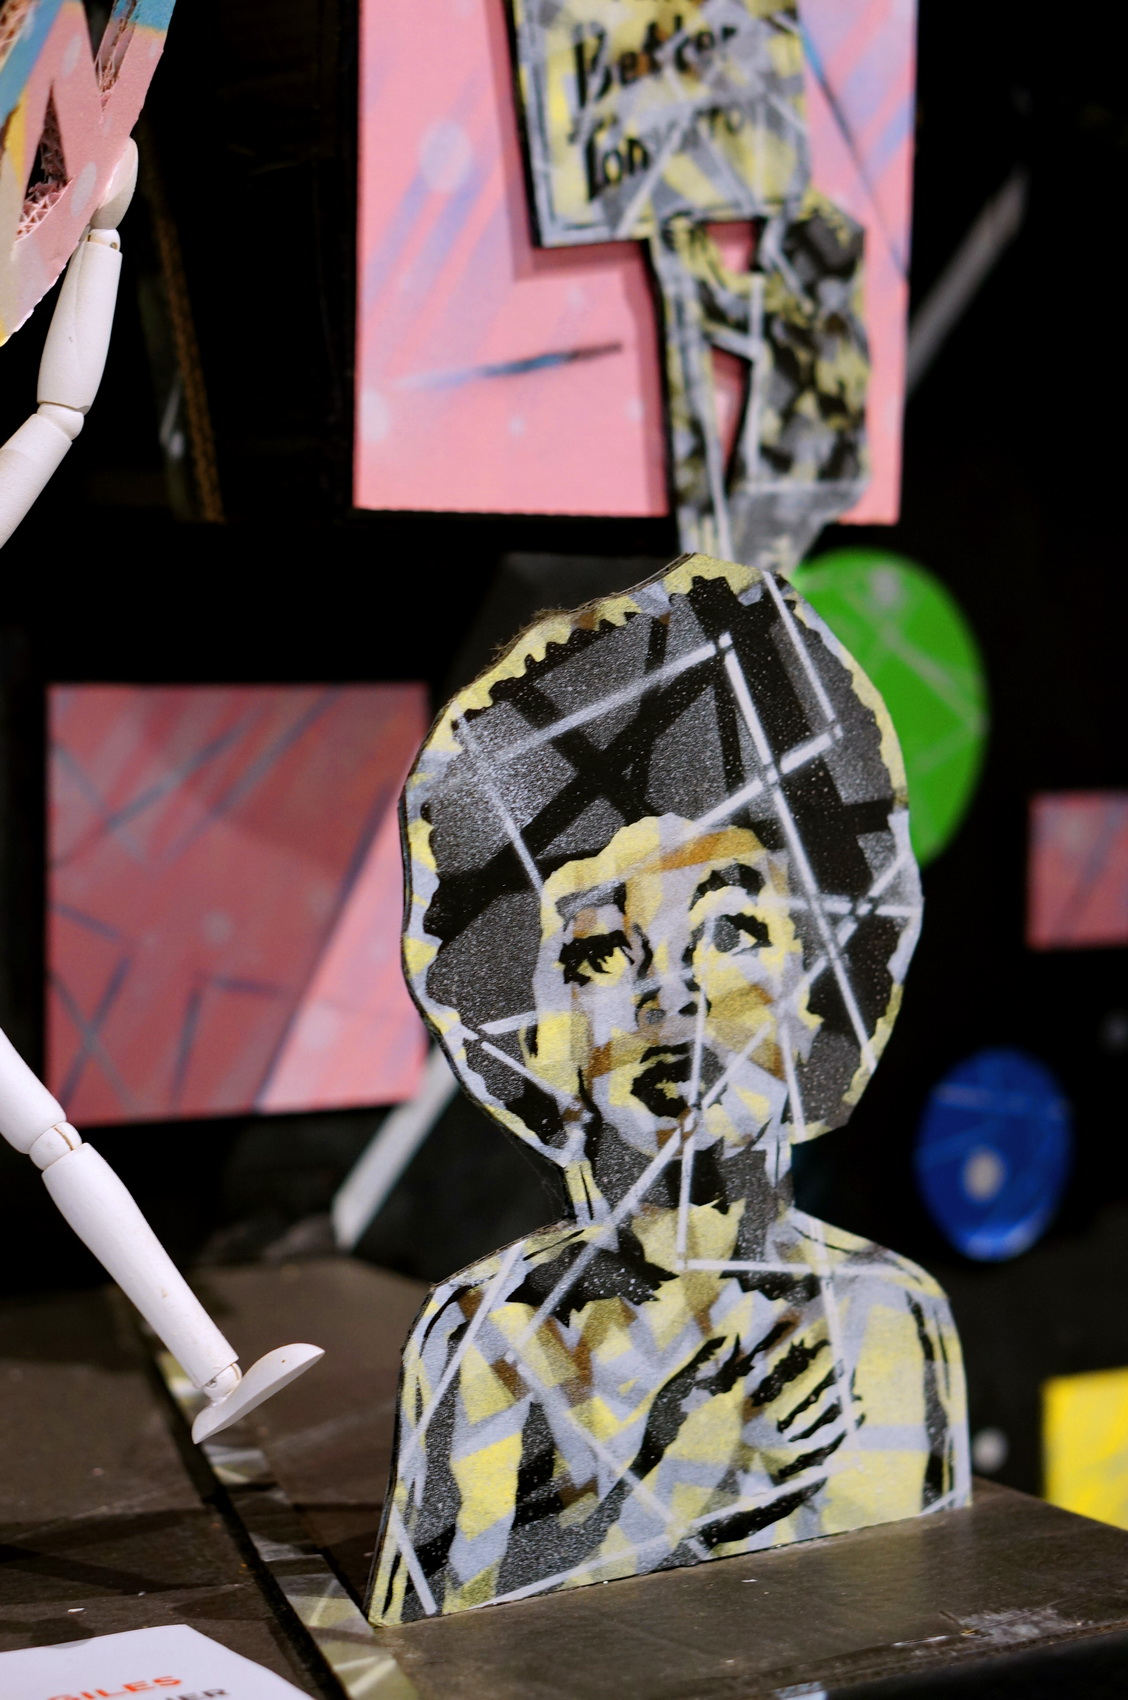 réserve malakoff, la réserve, la réserve malakoff, street art, street art paris, street art ile de france, urban art, wall art, art urbain, culture urbaine, ondes, shaka